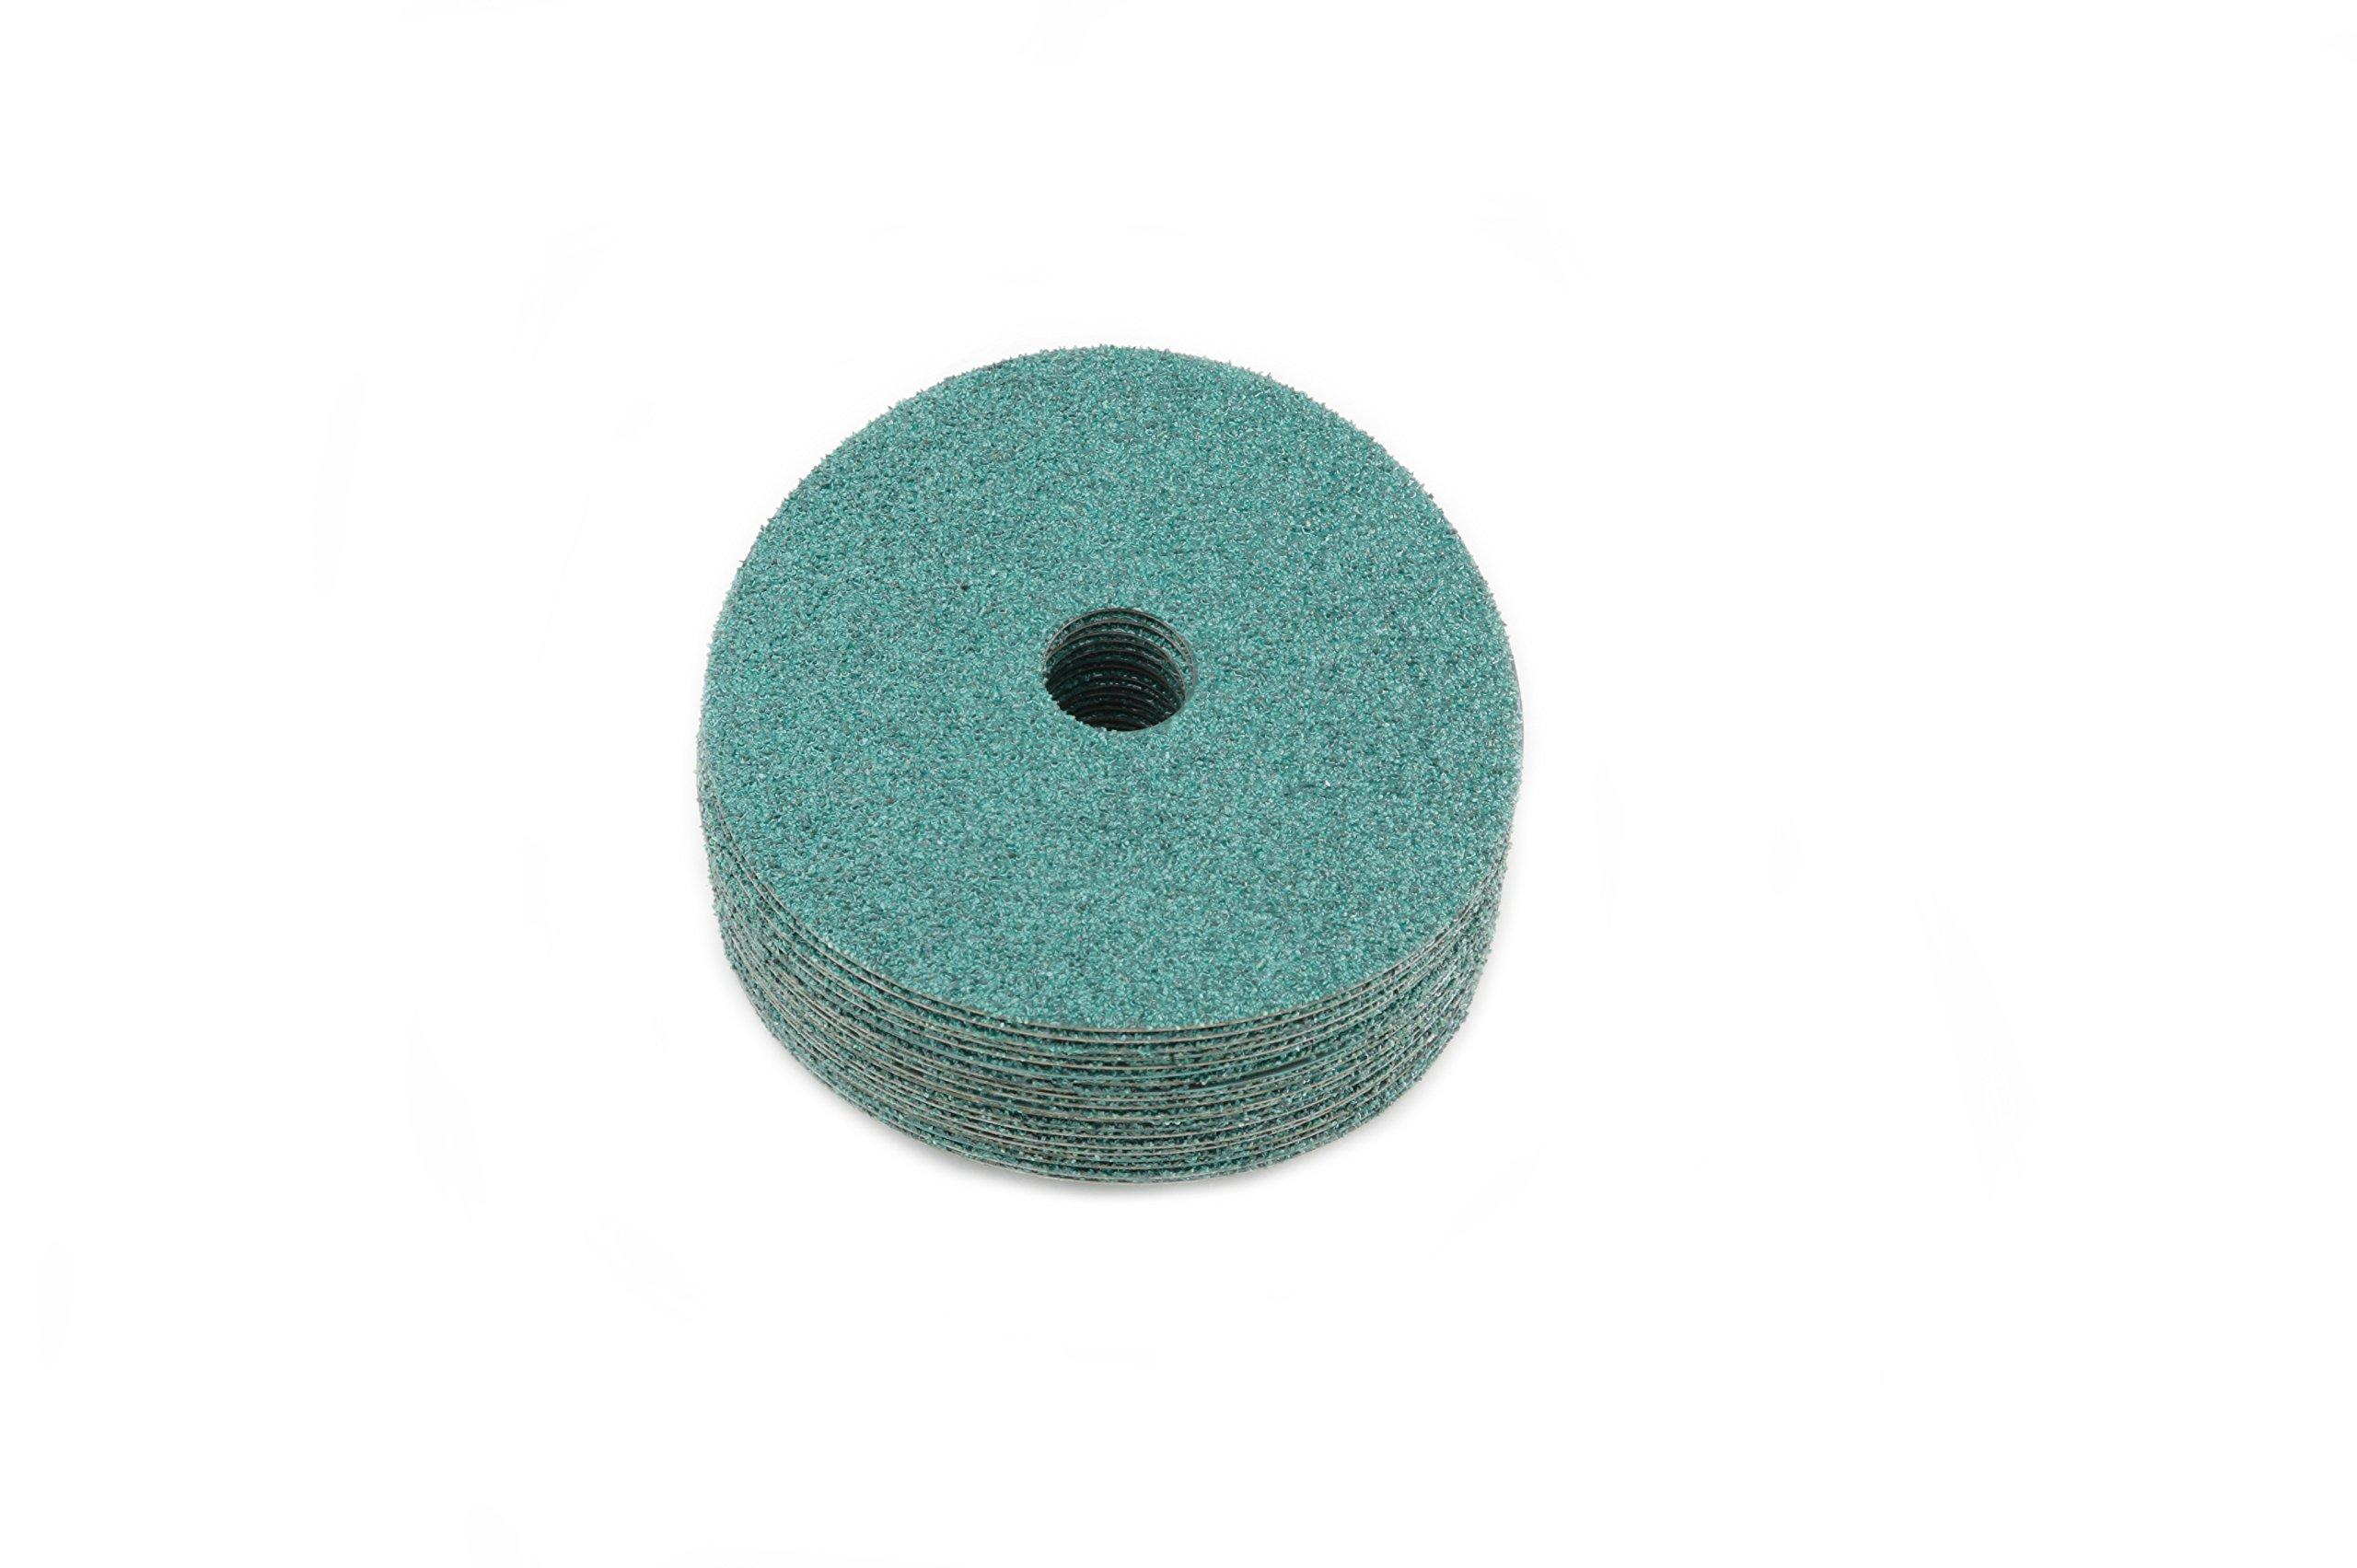 Sungold Abrasives 16961 Excella 24 Grit Green Ceramic Fiber 20/Box 4-1/2'' x 7/8'' Center Hole Center Hole Sanding Discs